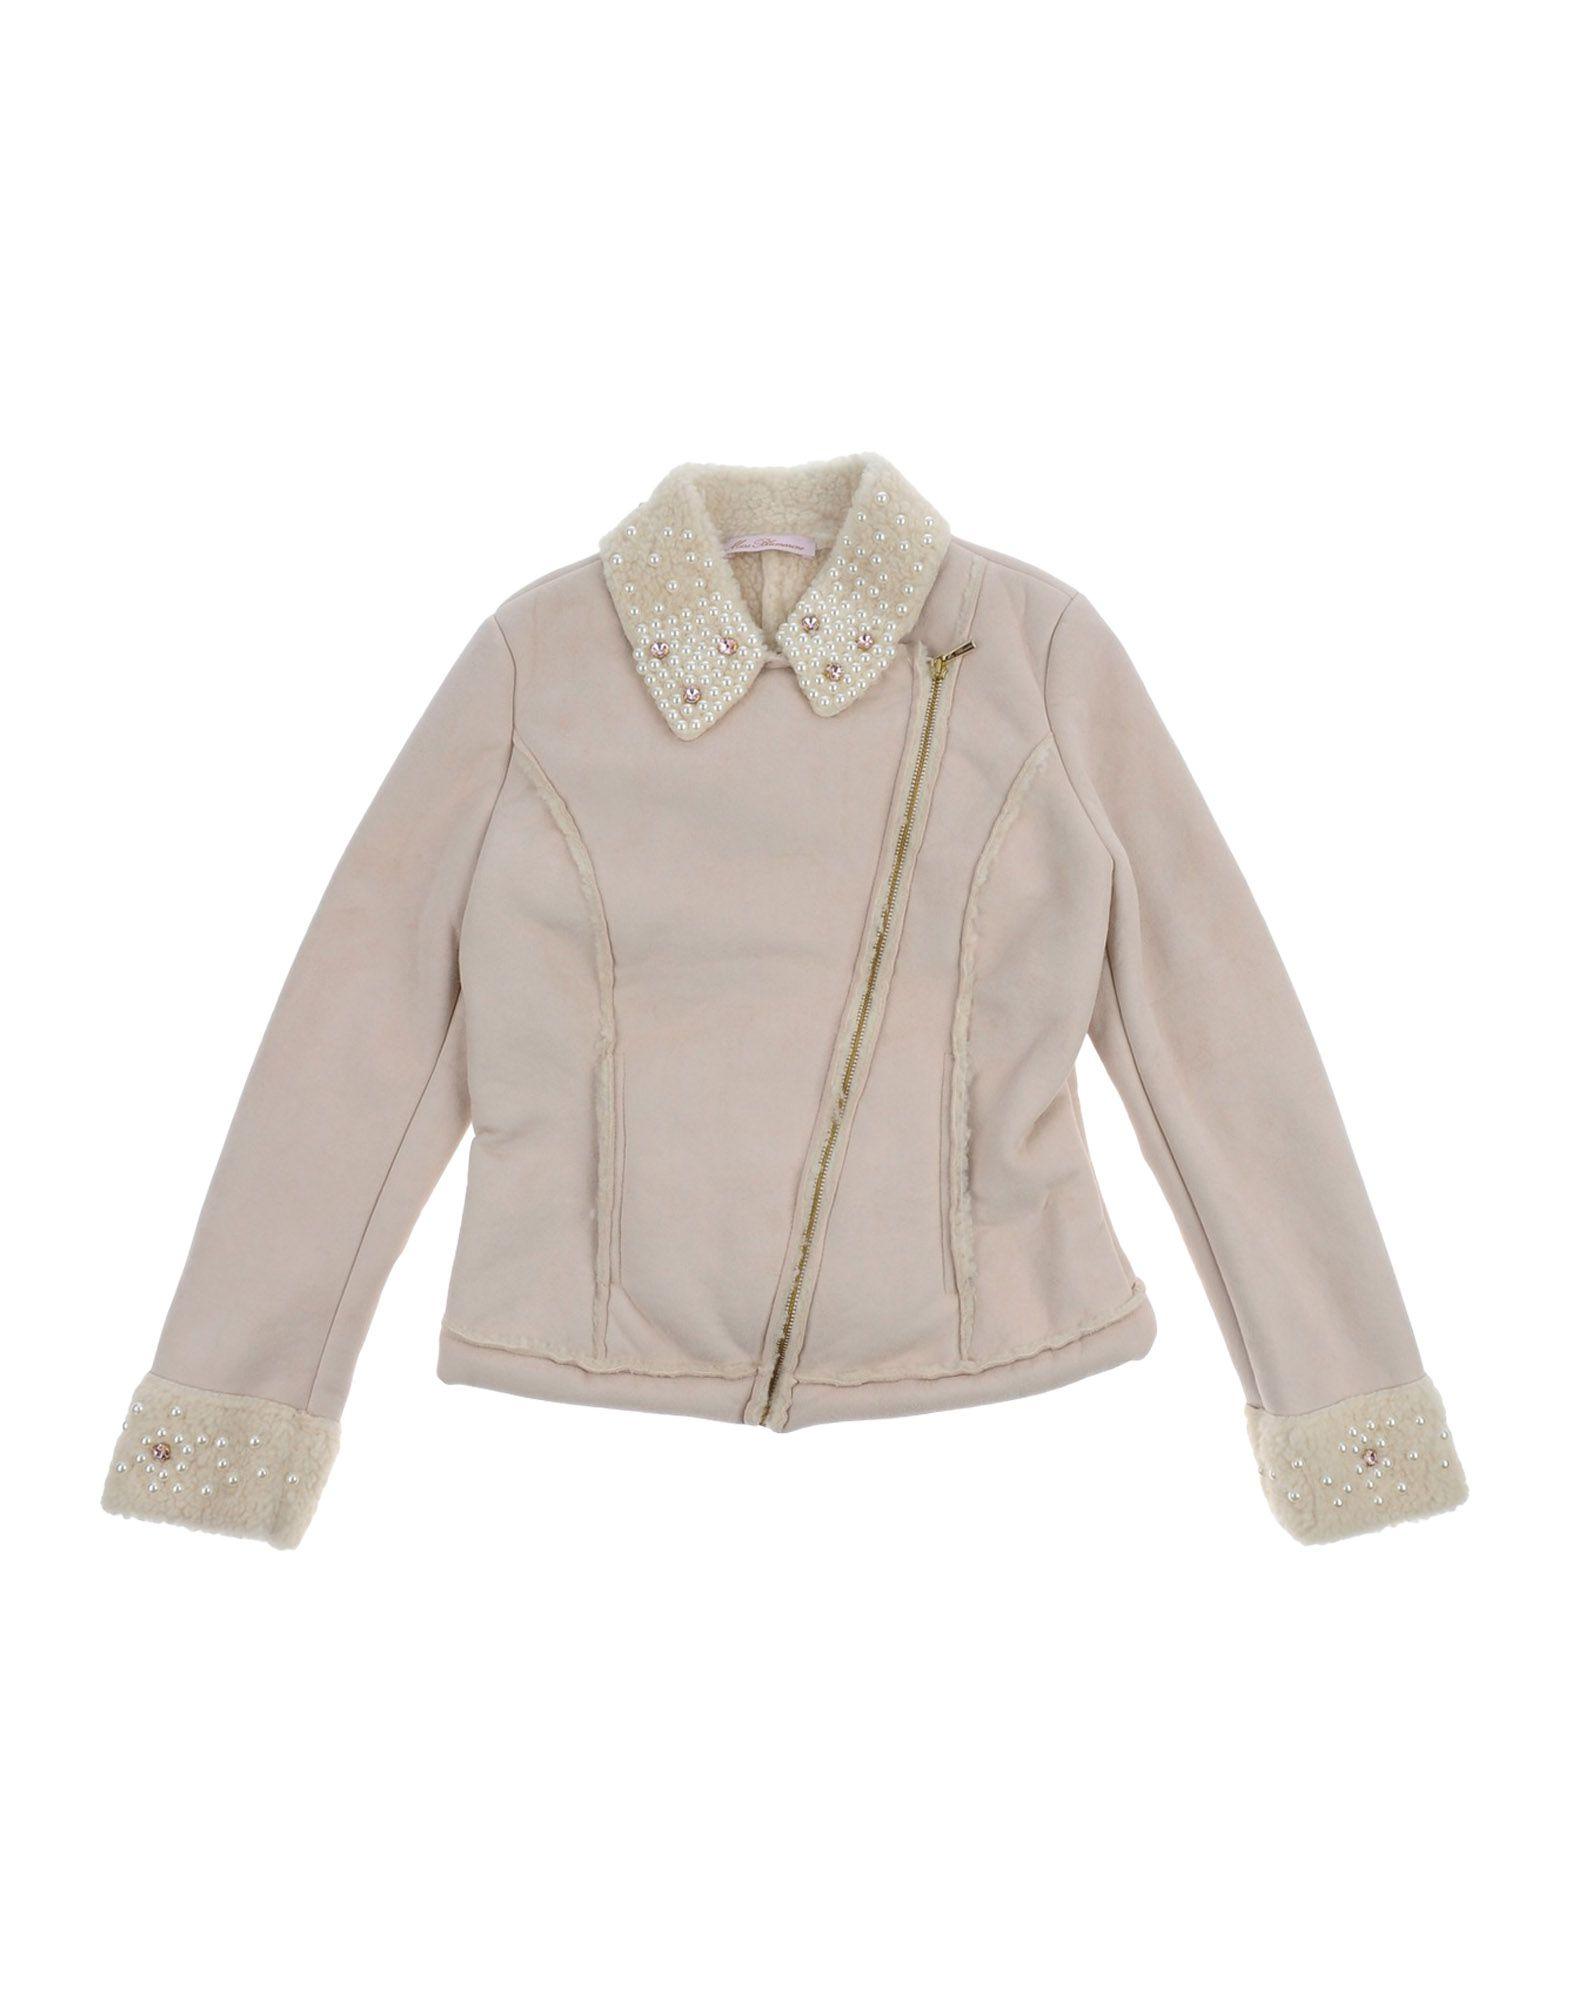 MISS BLUMARINE Куртка blumarine куртка blumarine 4303 blumarine ss15 белый